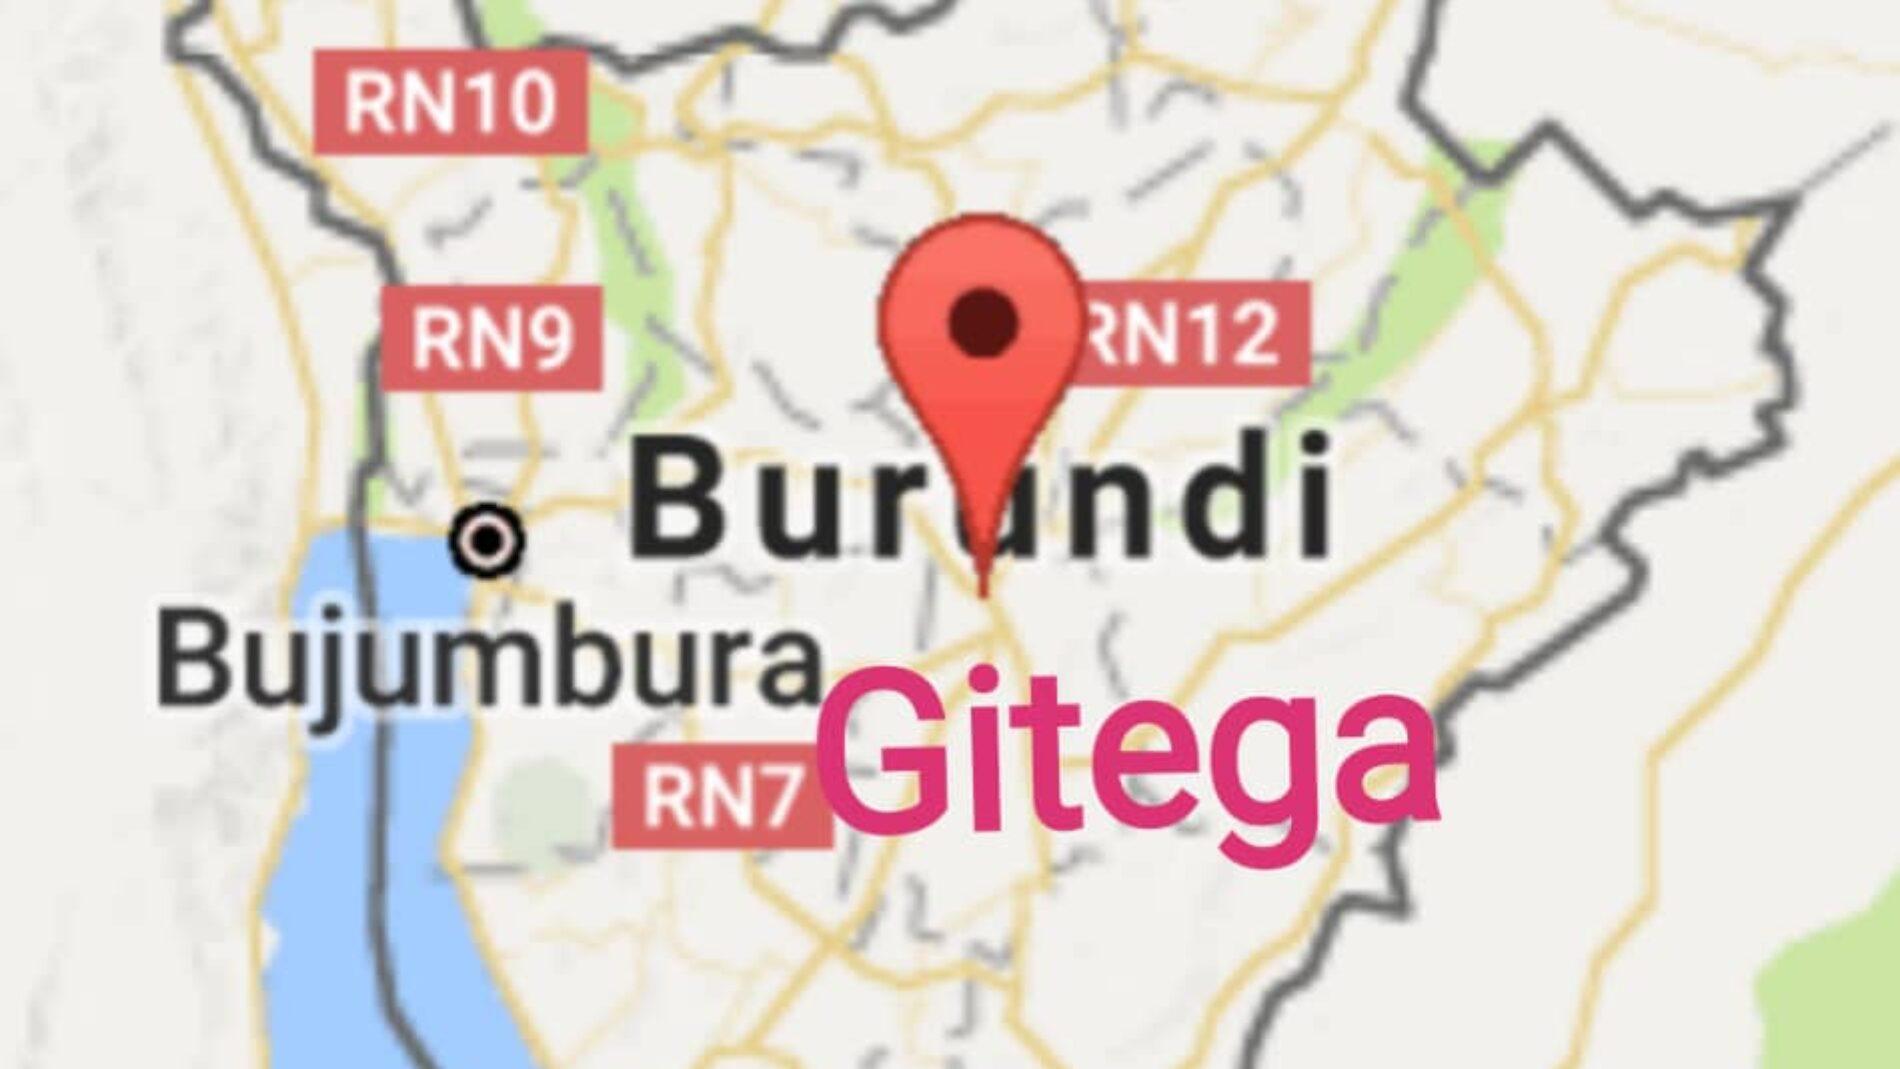 Mutaho (Gitega) : attaque à la grenade au domicile de l'administrateur